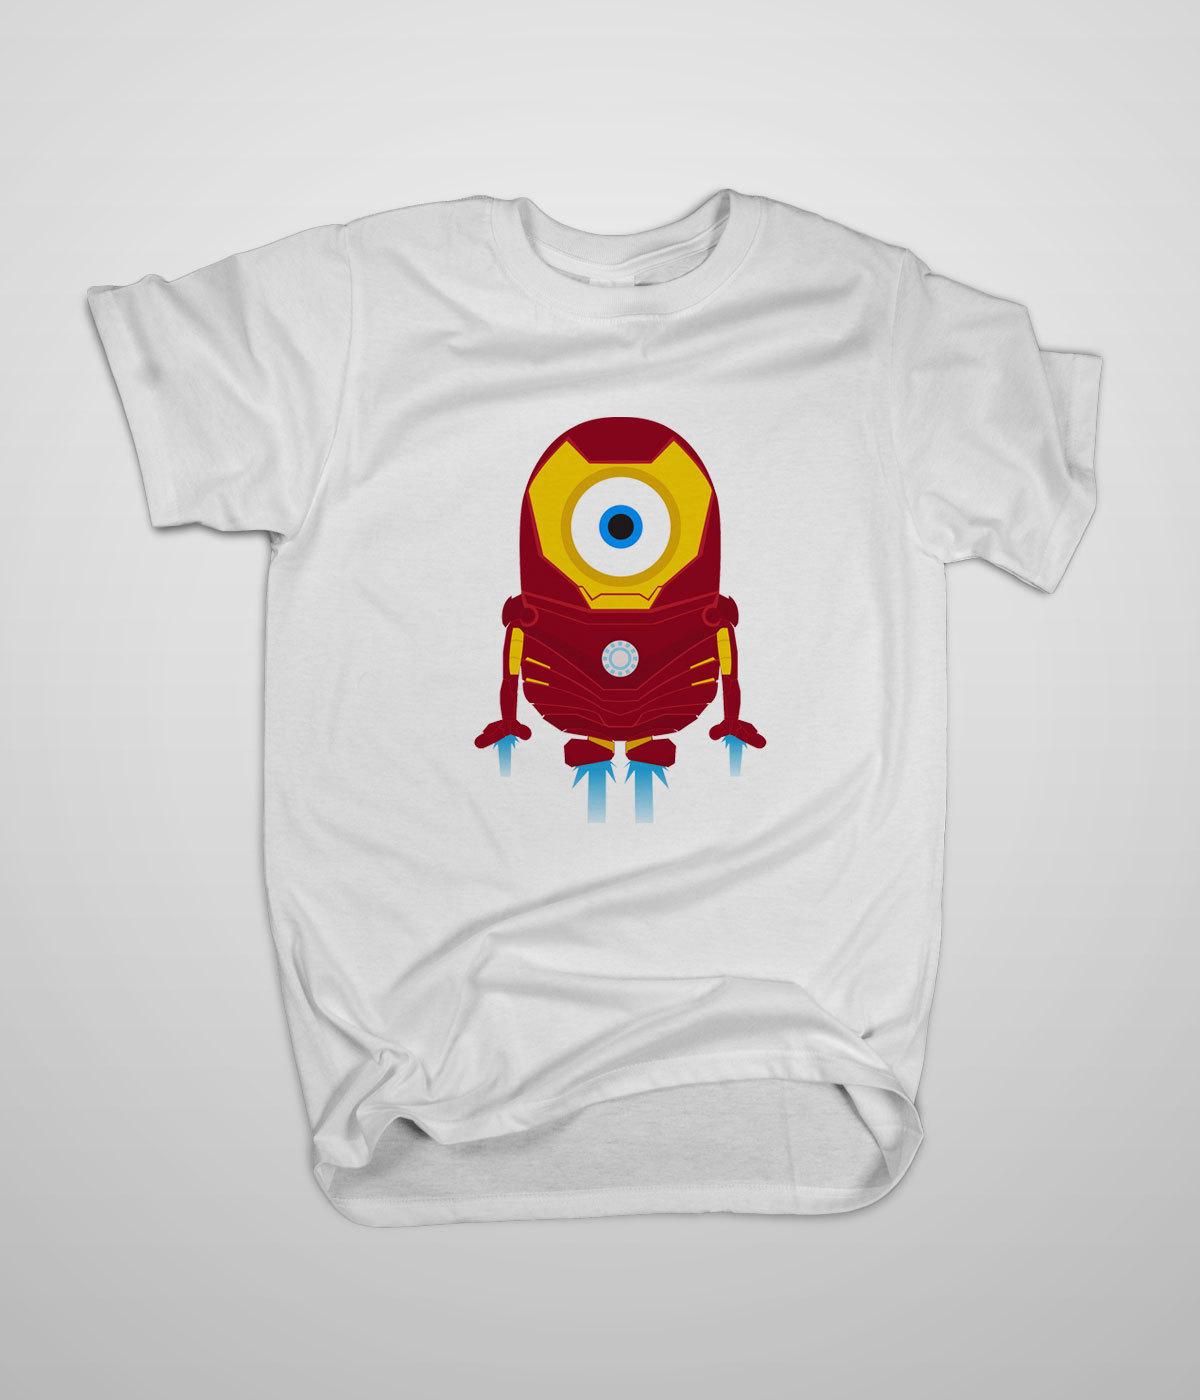 Despicable me minion iron man avenger t shirt s 3xl high for High quality custom shirts